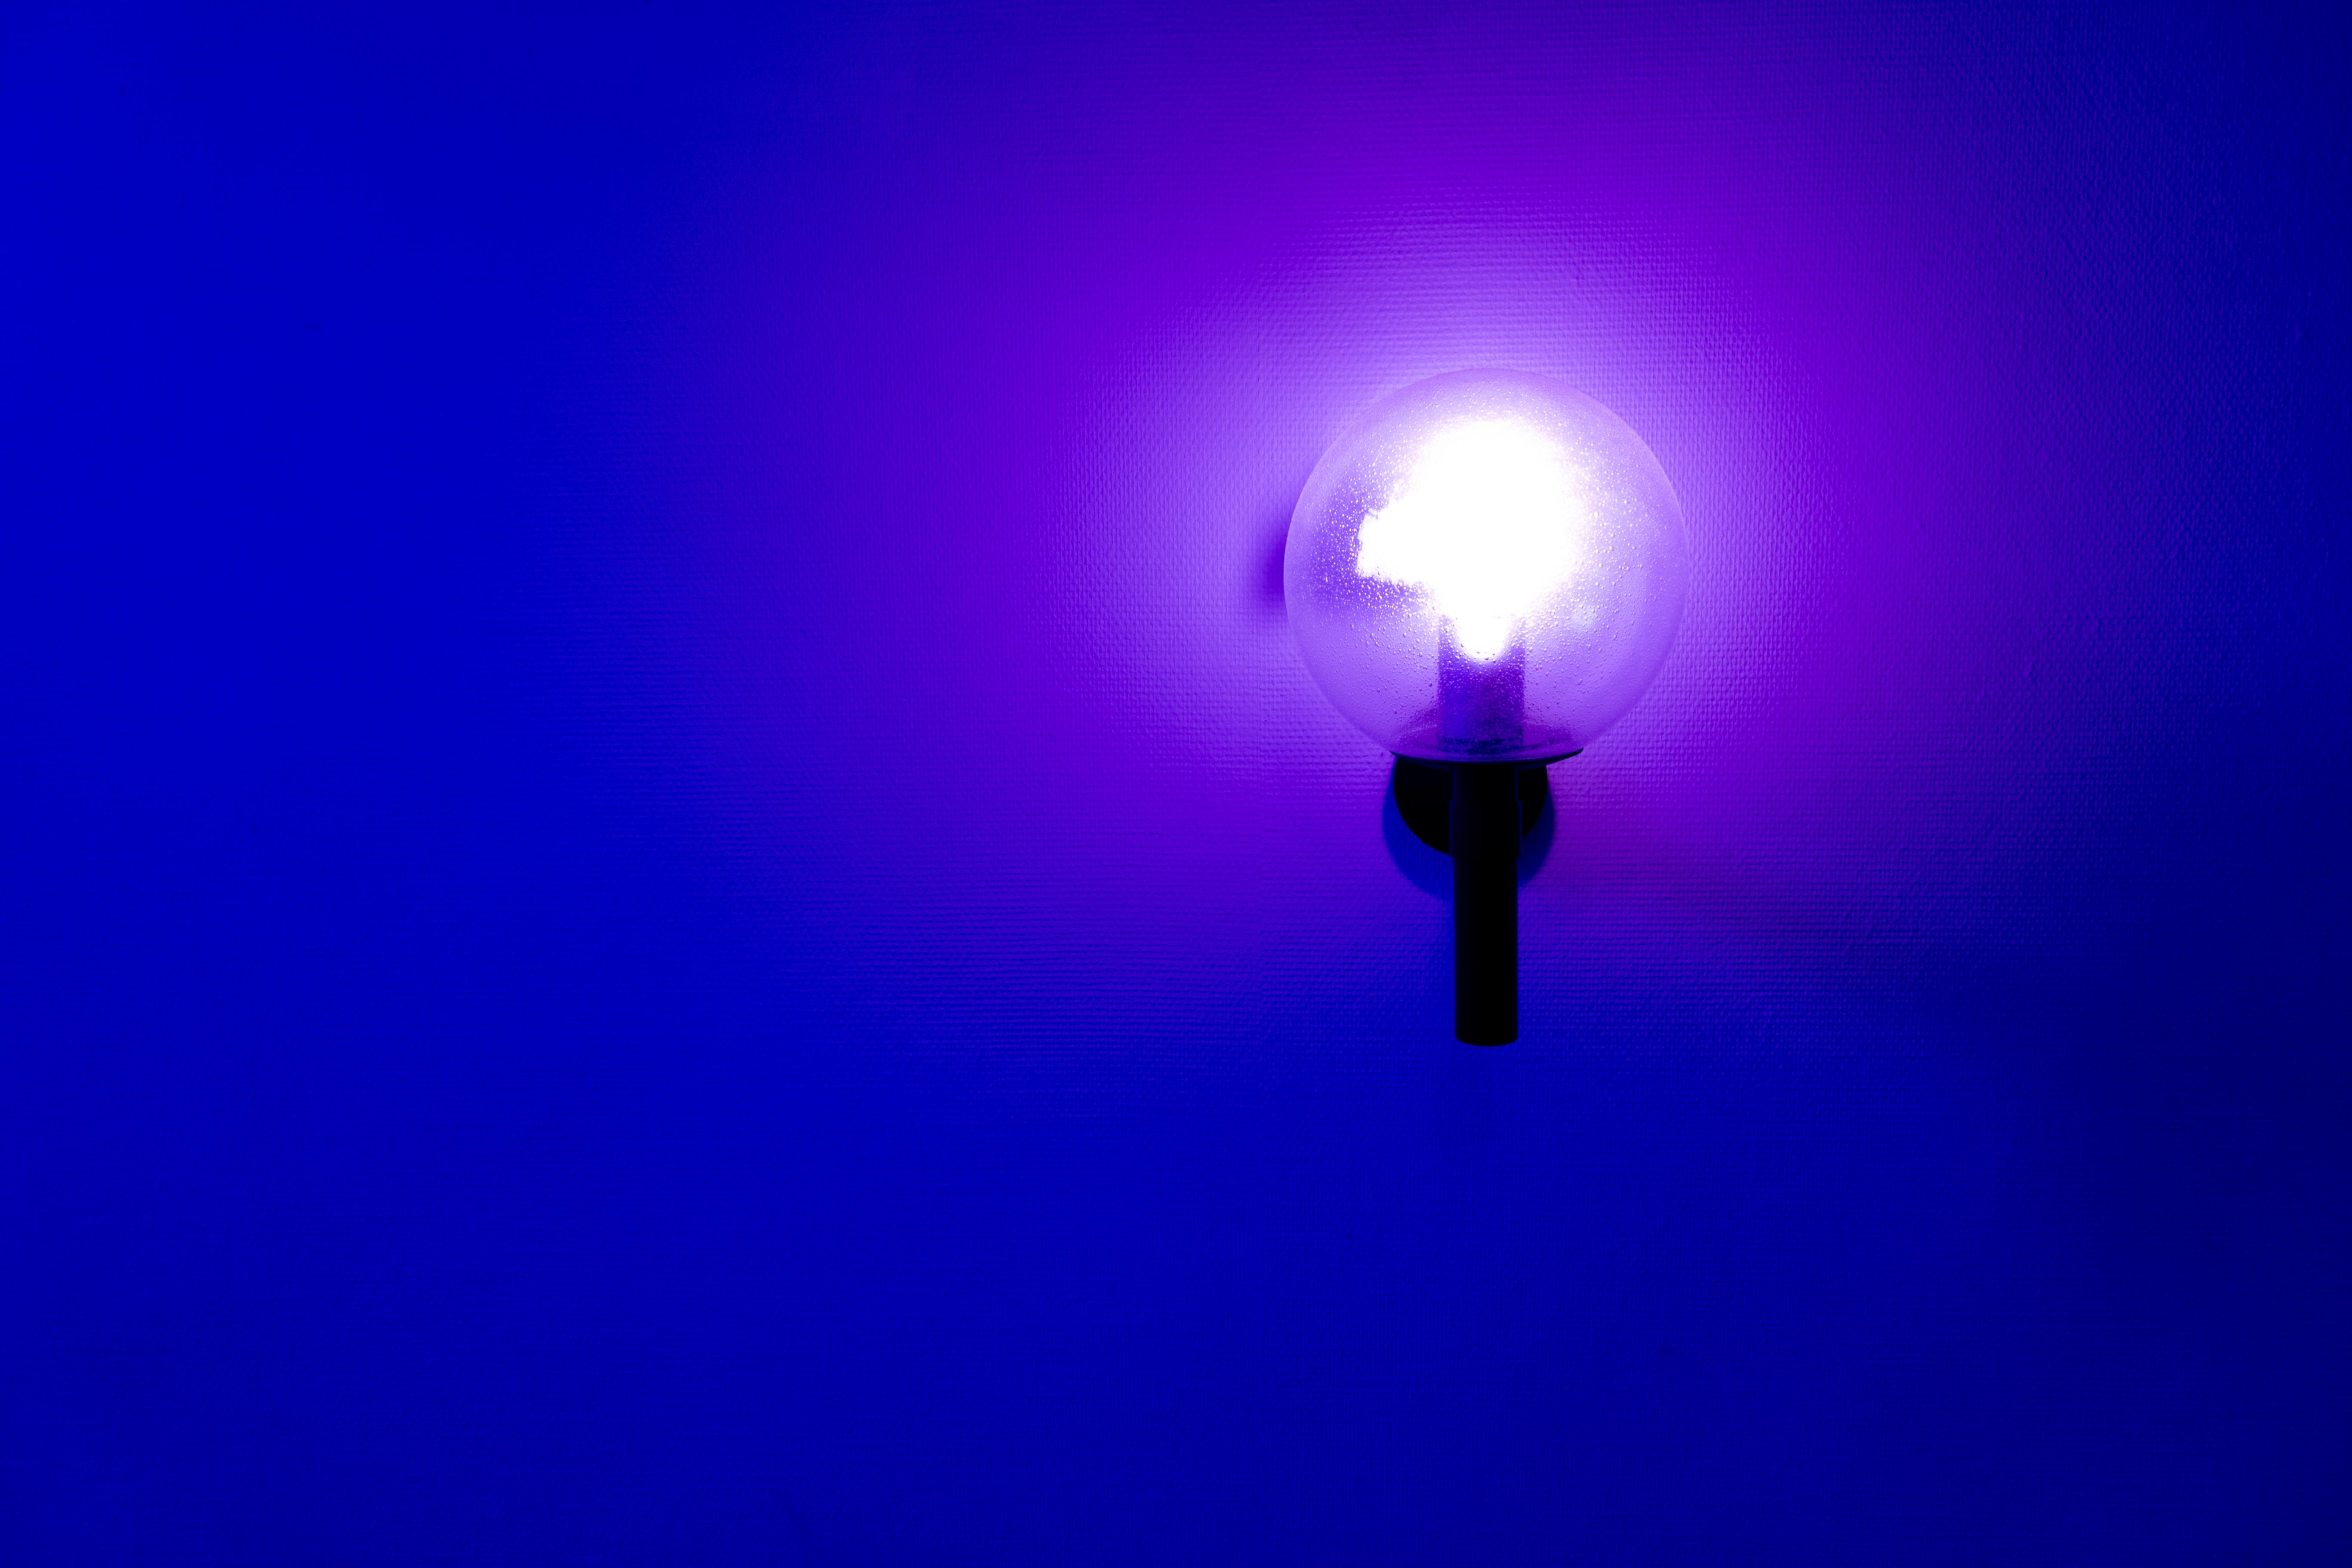 light sky dark lantern blue street light lamp lighting circle lens flare neon light blue light neon blue computer wallpaper 925644